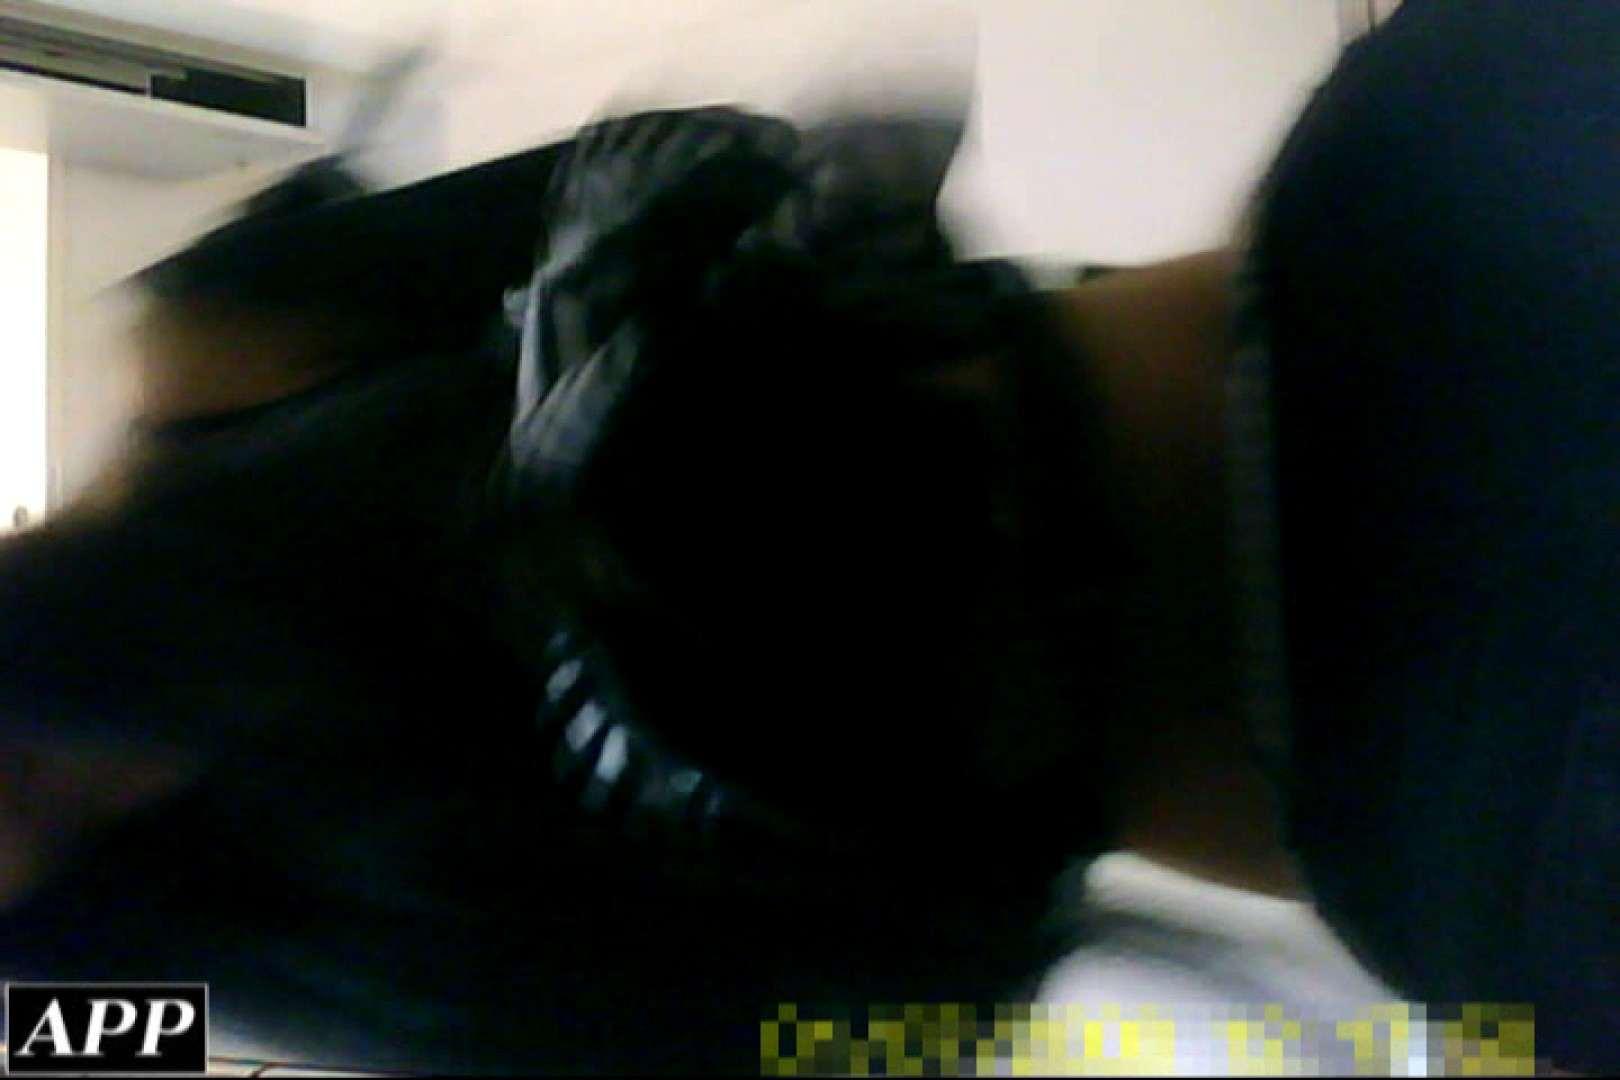 3視点洗面所 vol.092 洗面所 | OLセックス  101画像 89